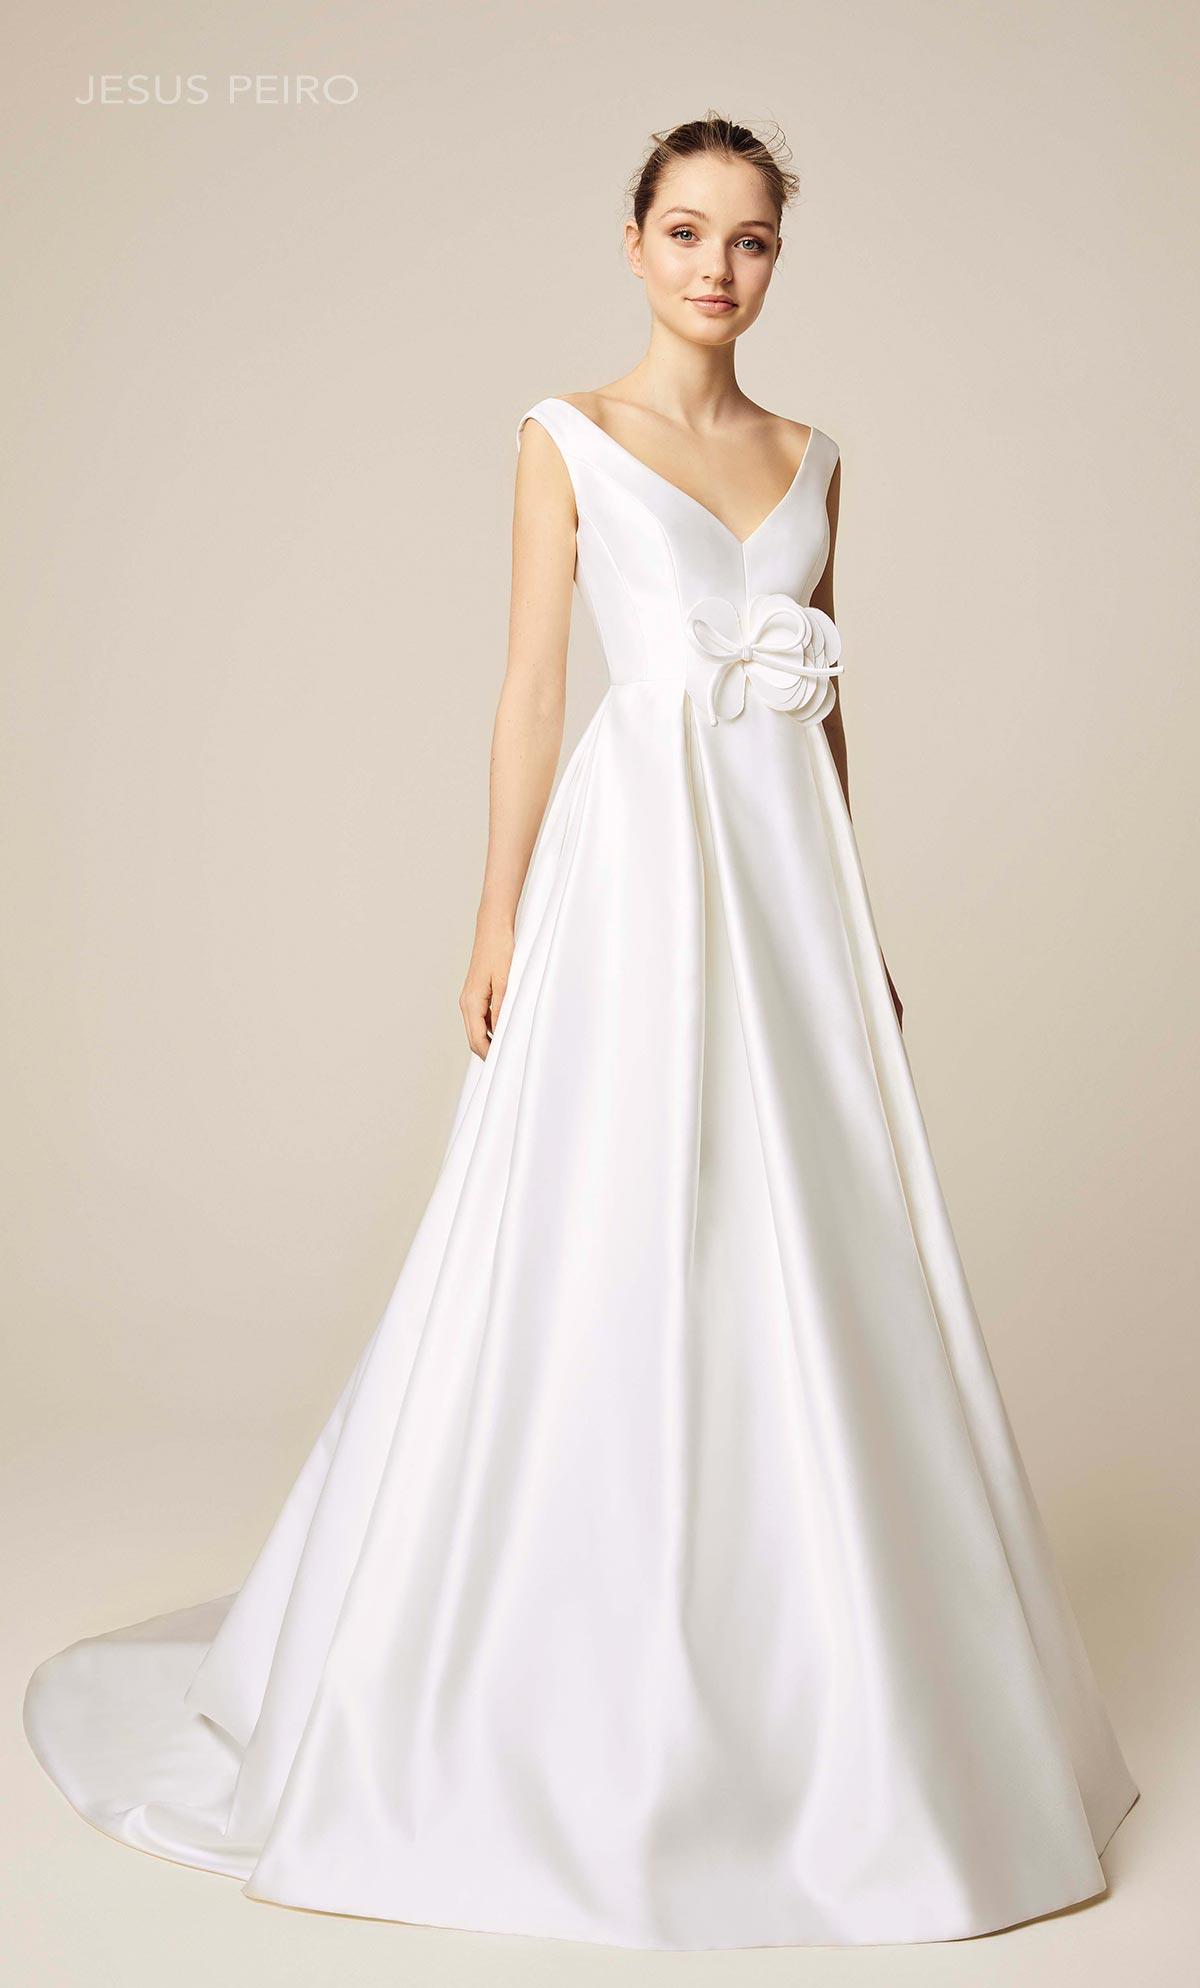 Vestido novia Jesús Peiró Ref.950